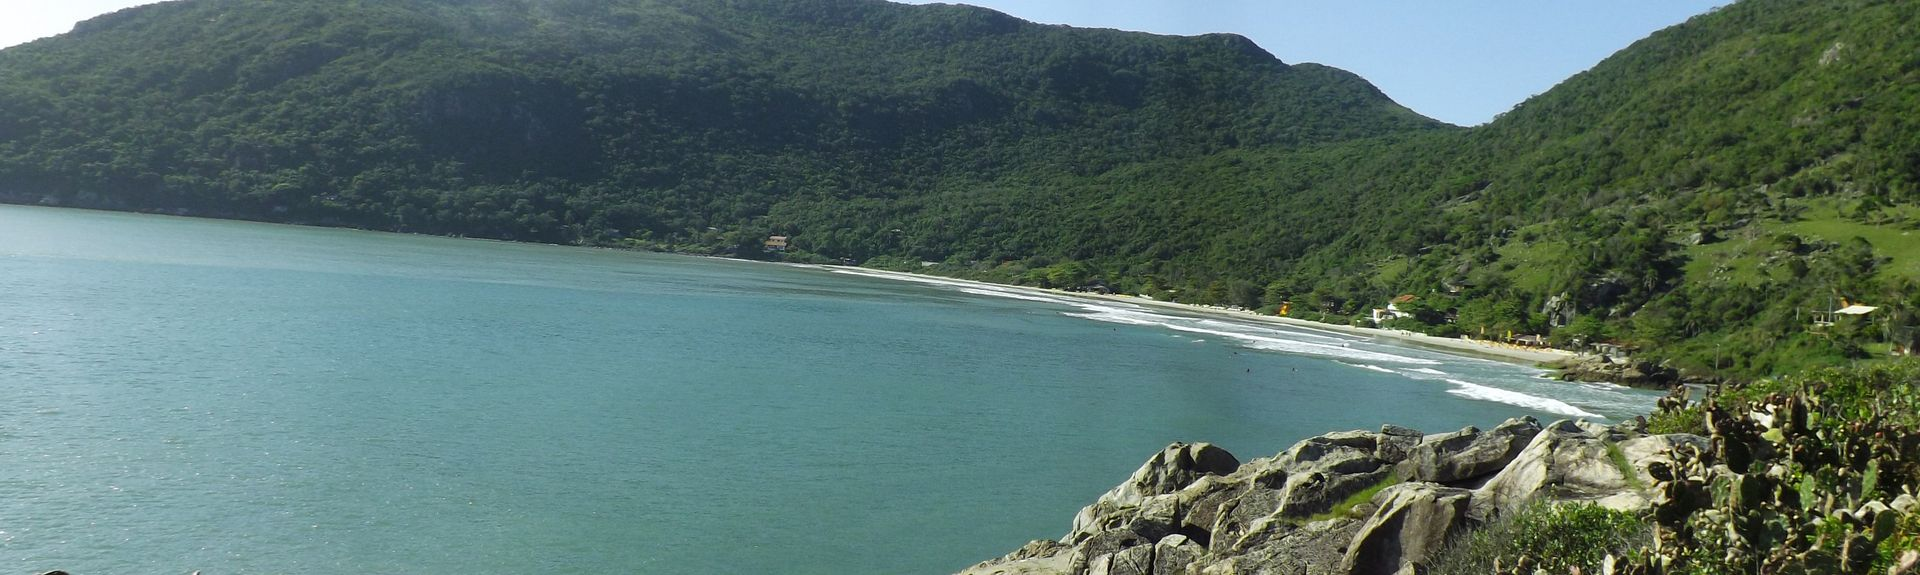 Solidao Beach, Florianopolis, Brazil